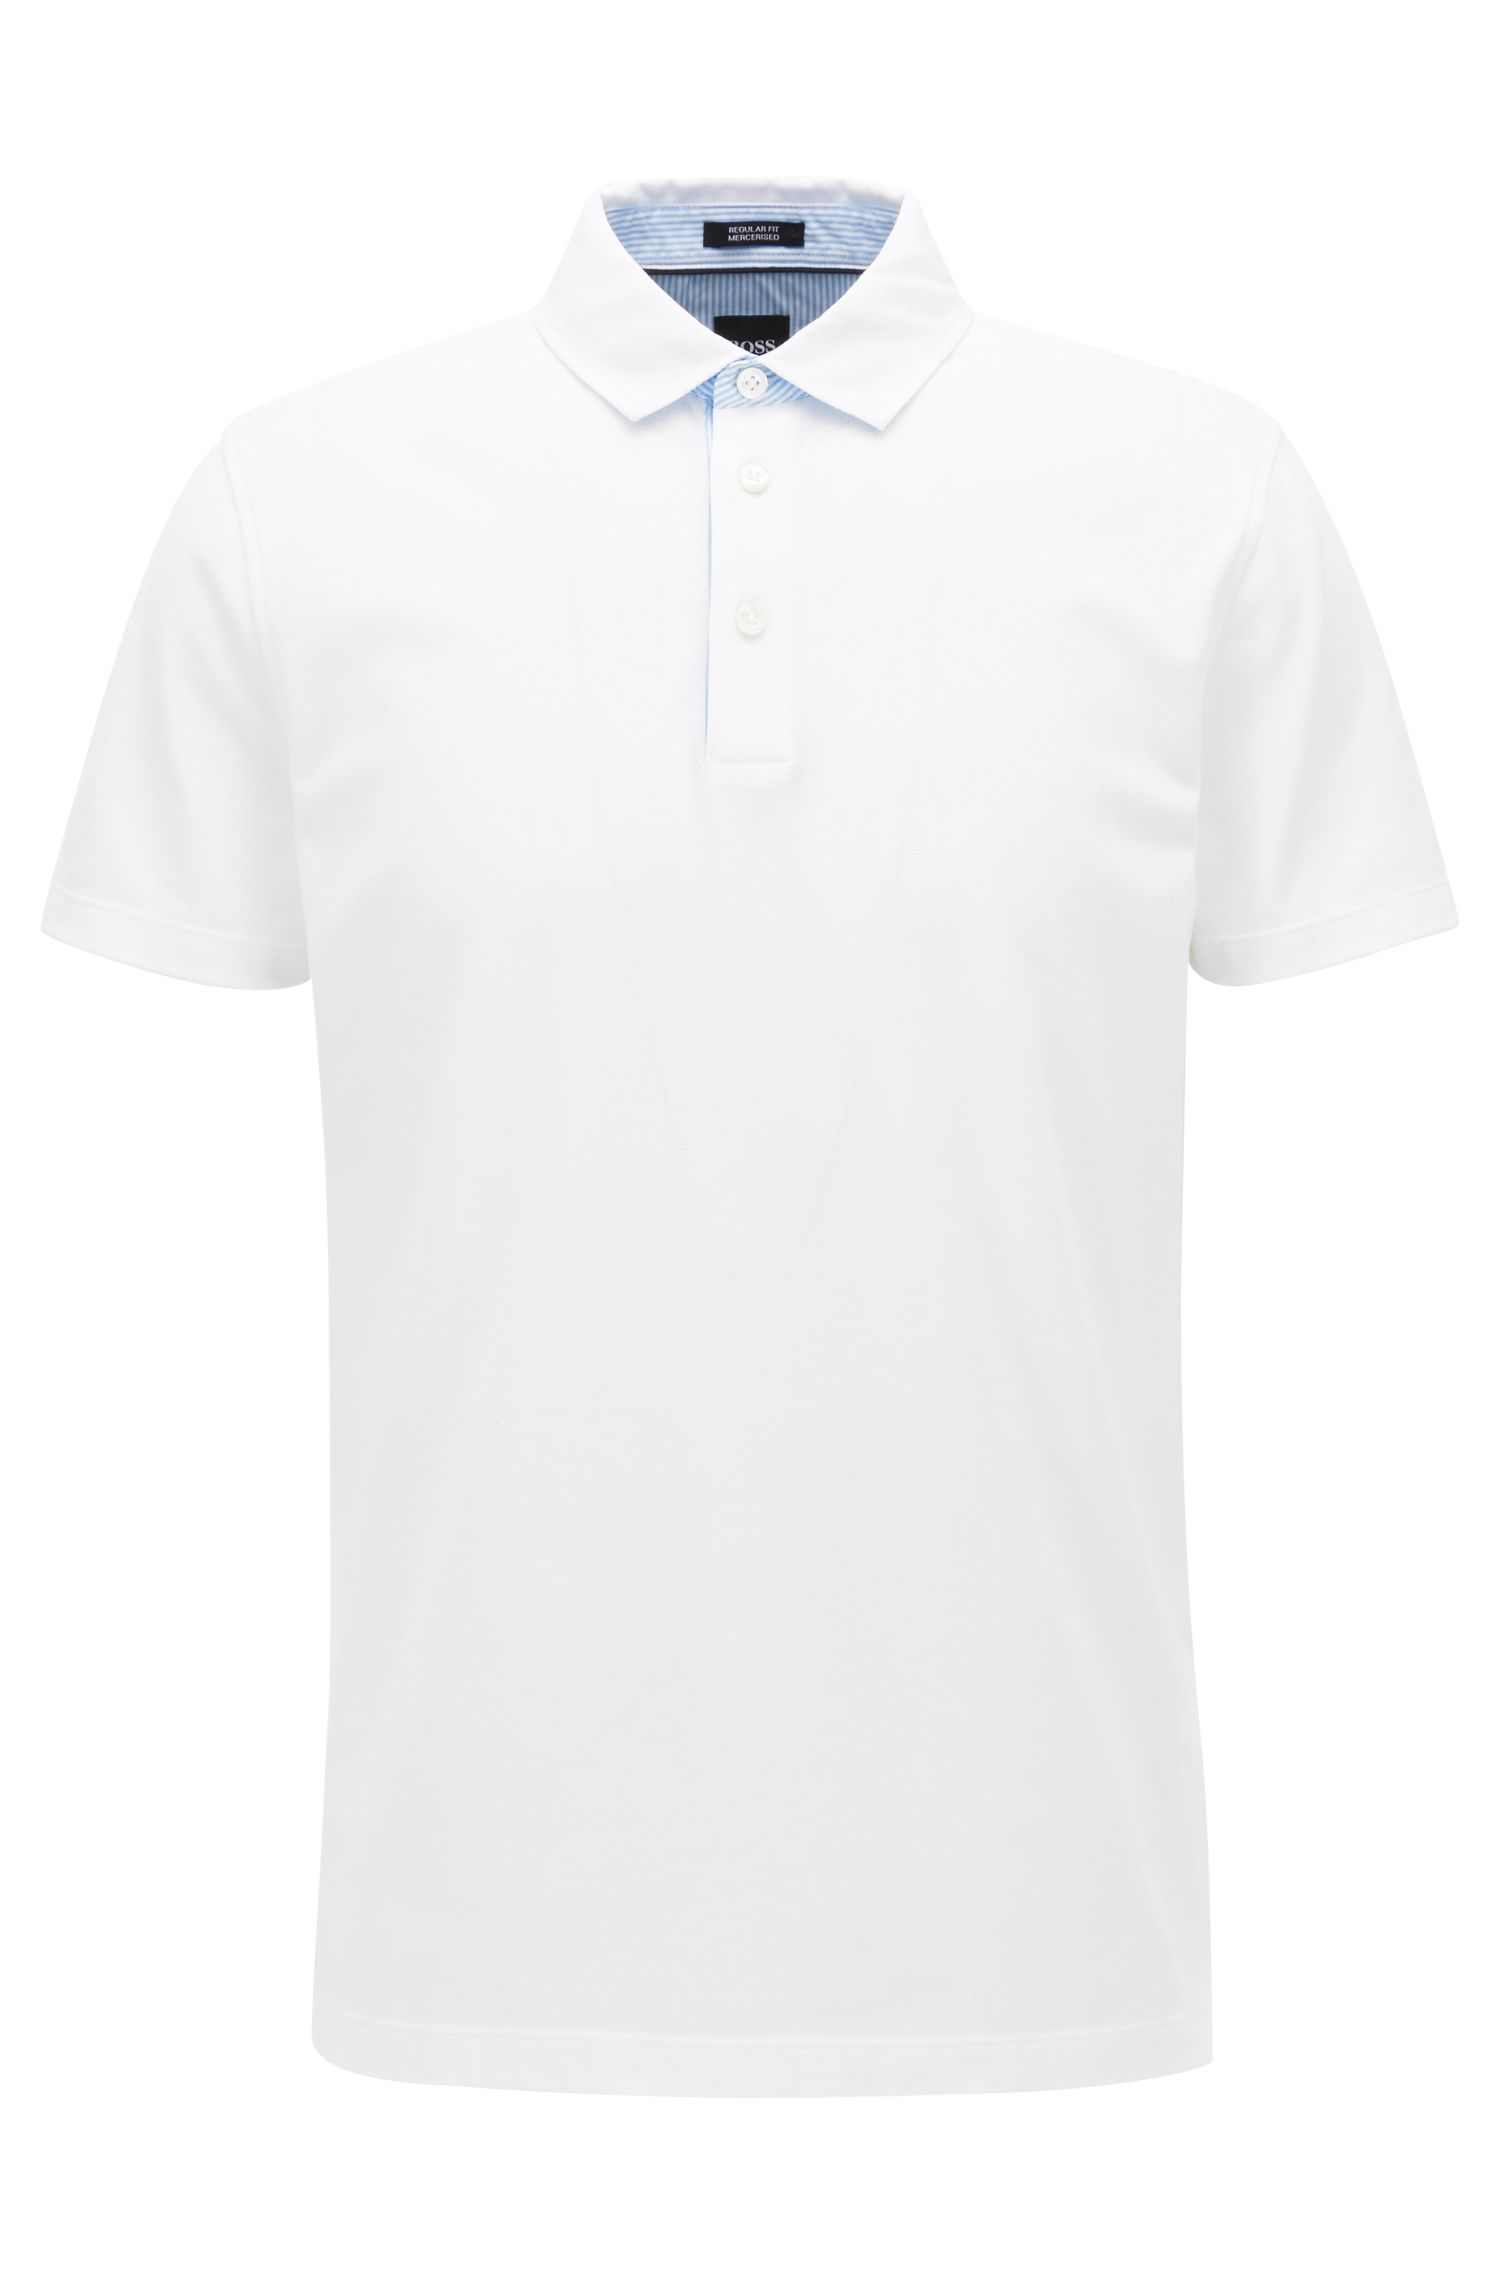 Polo shirt in mercerised piqué cotton